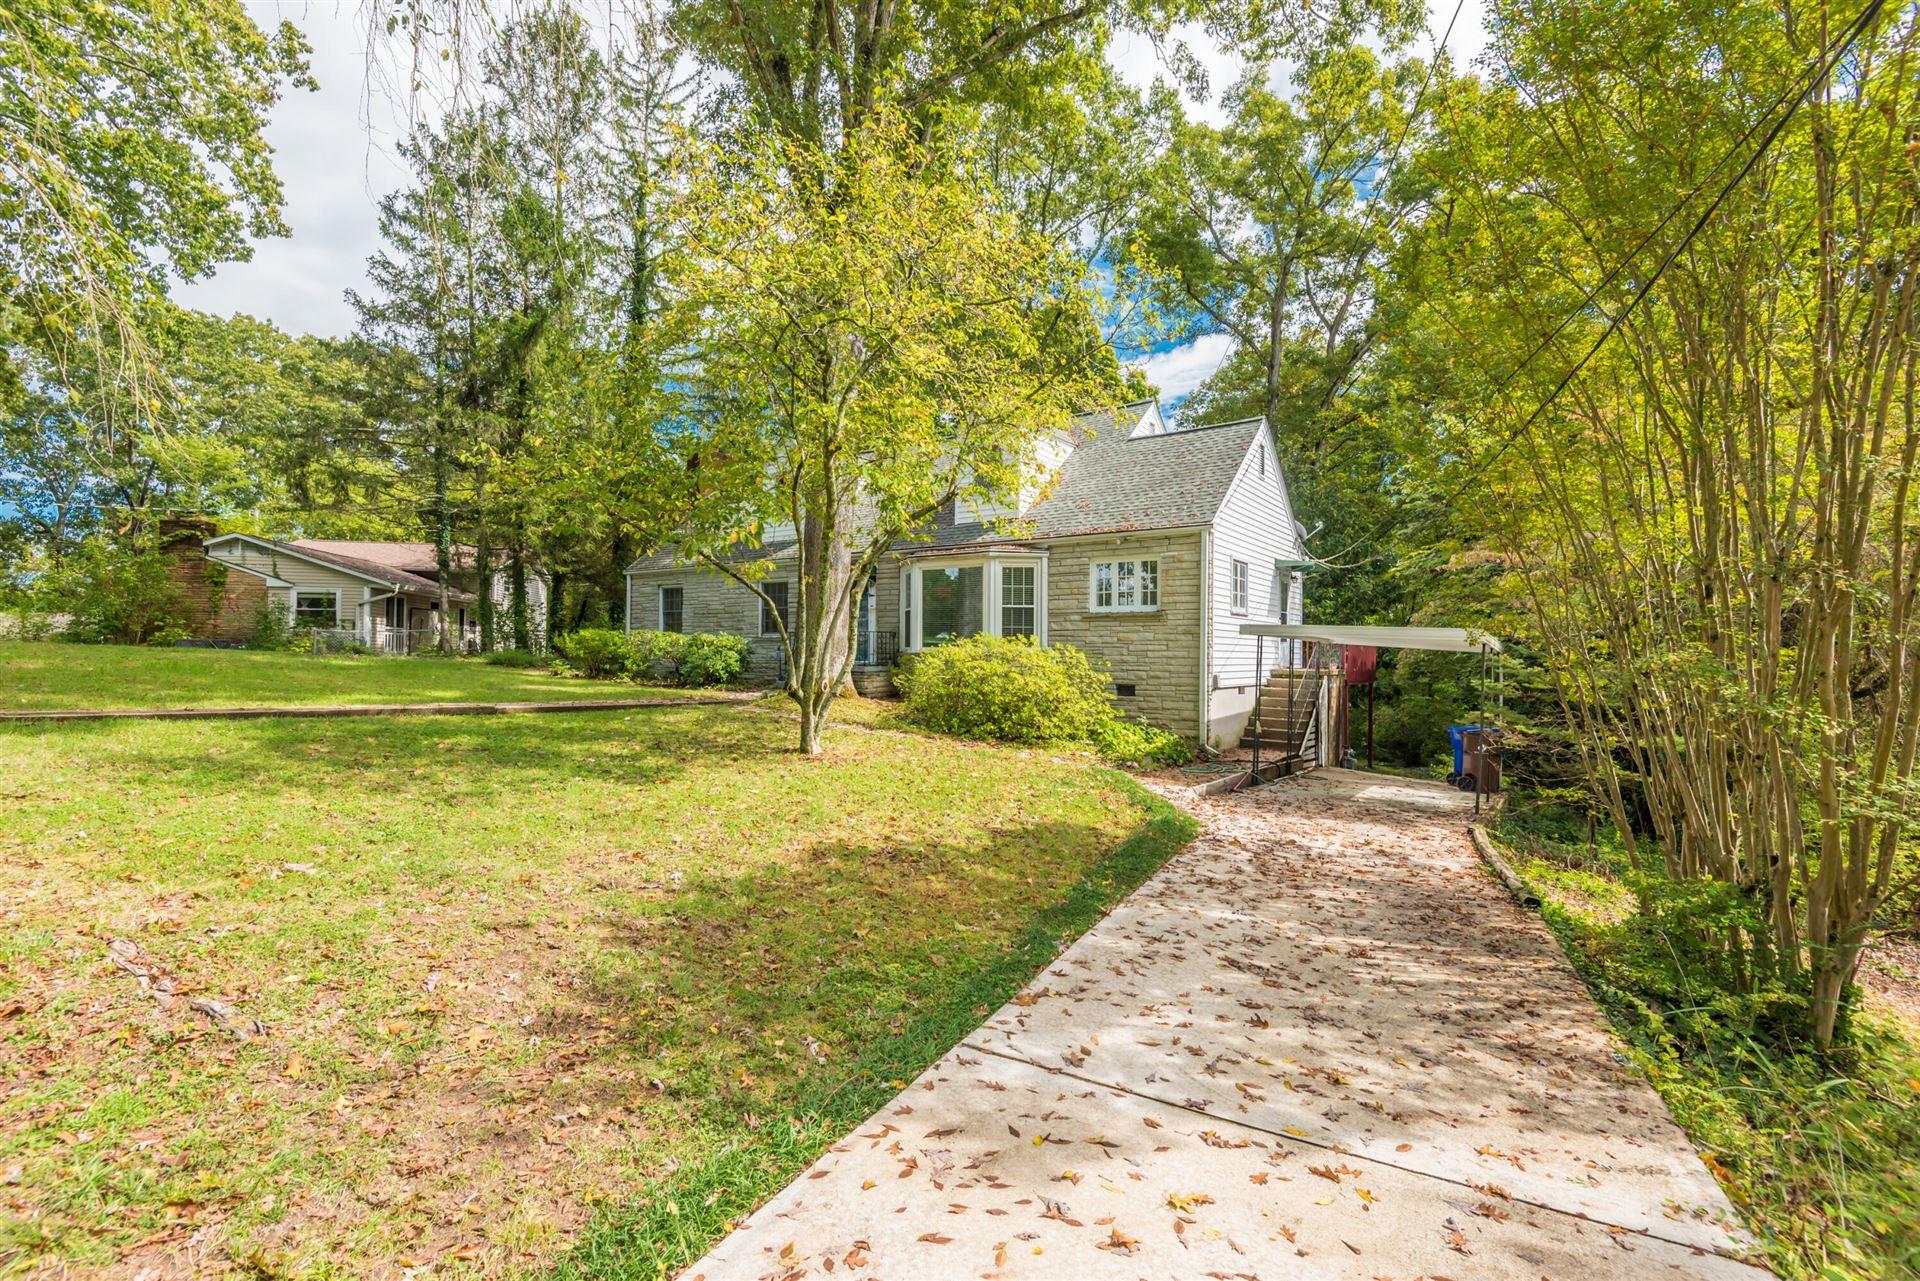 Photo of 387 East Drive, Oak Ridge, TN 37830 (MLS # 1170104)